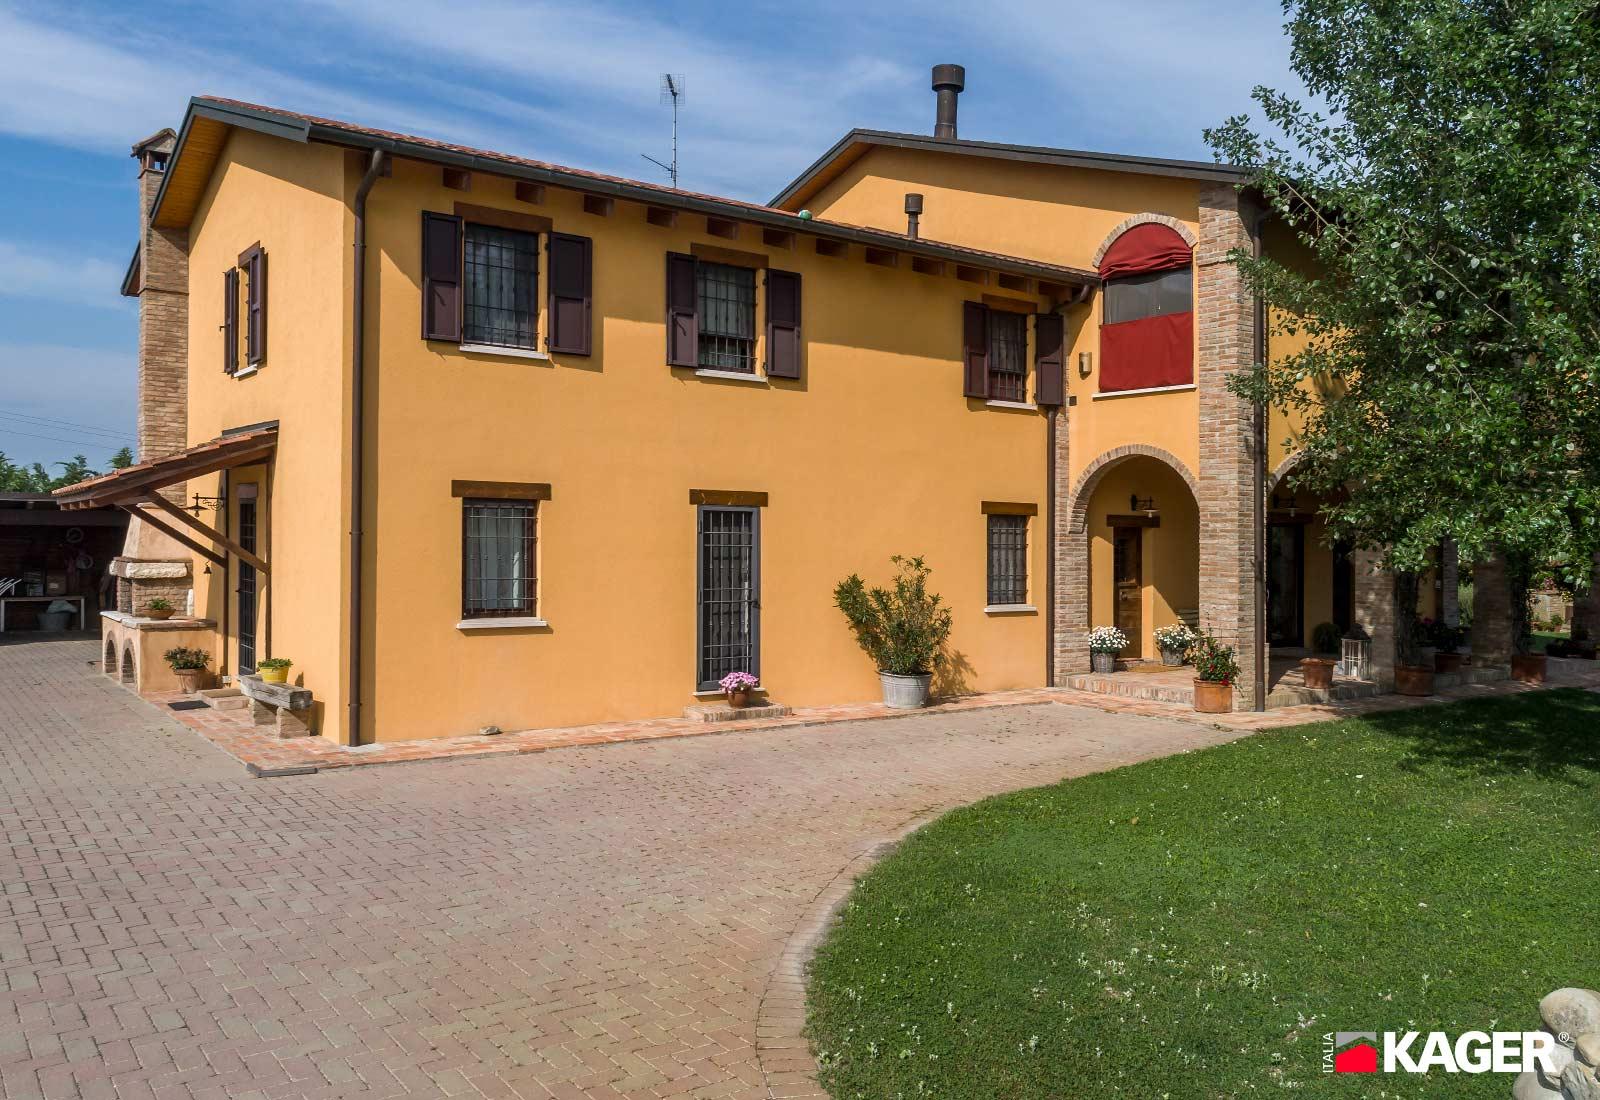 Casa-in-legno-Ferrara-Kager-Italia-02